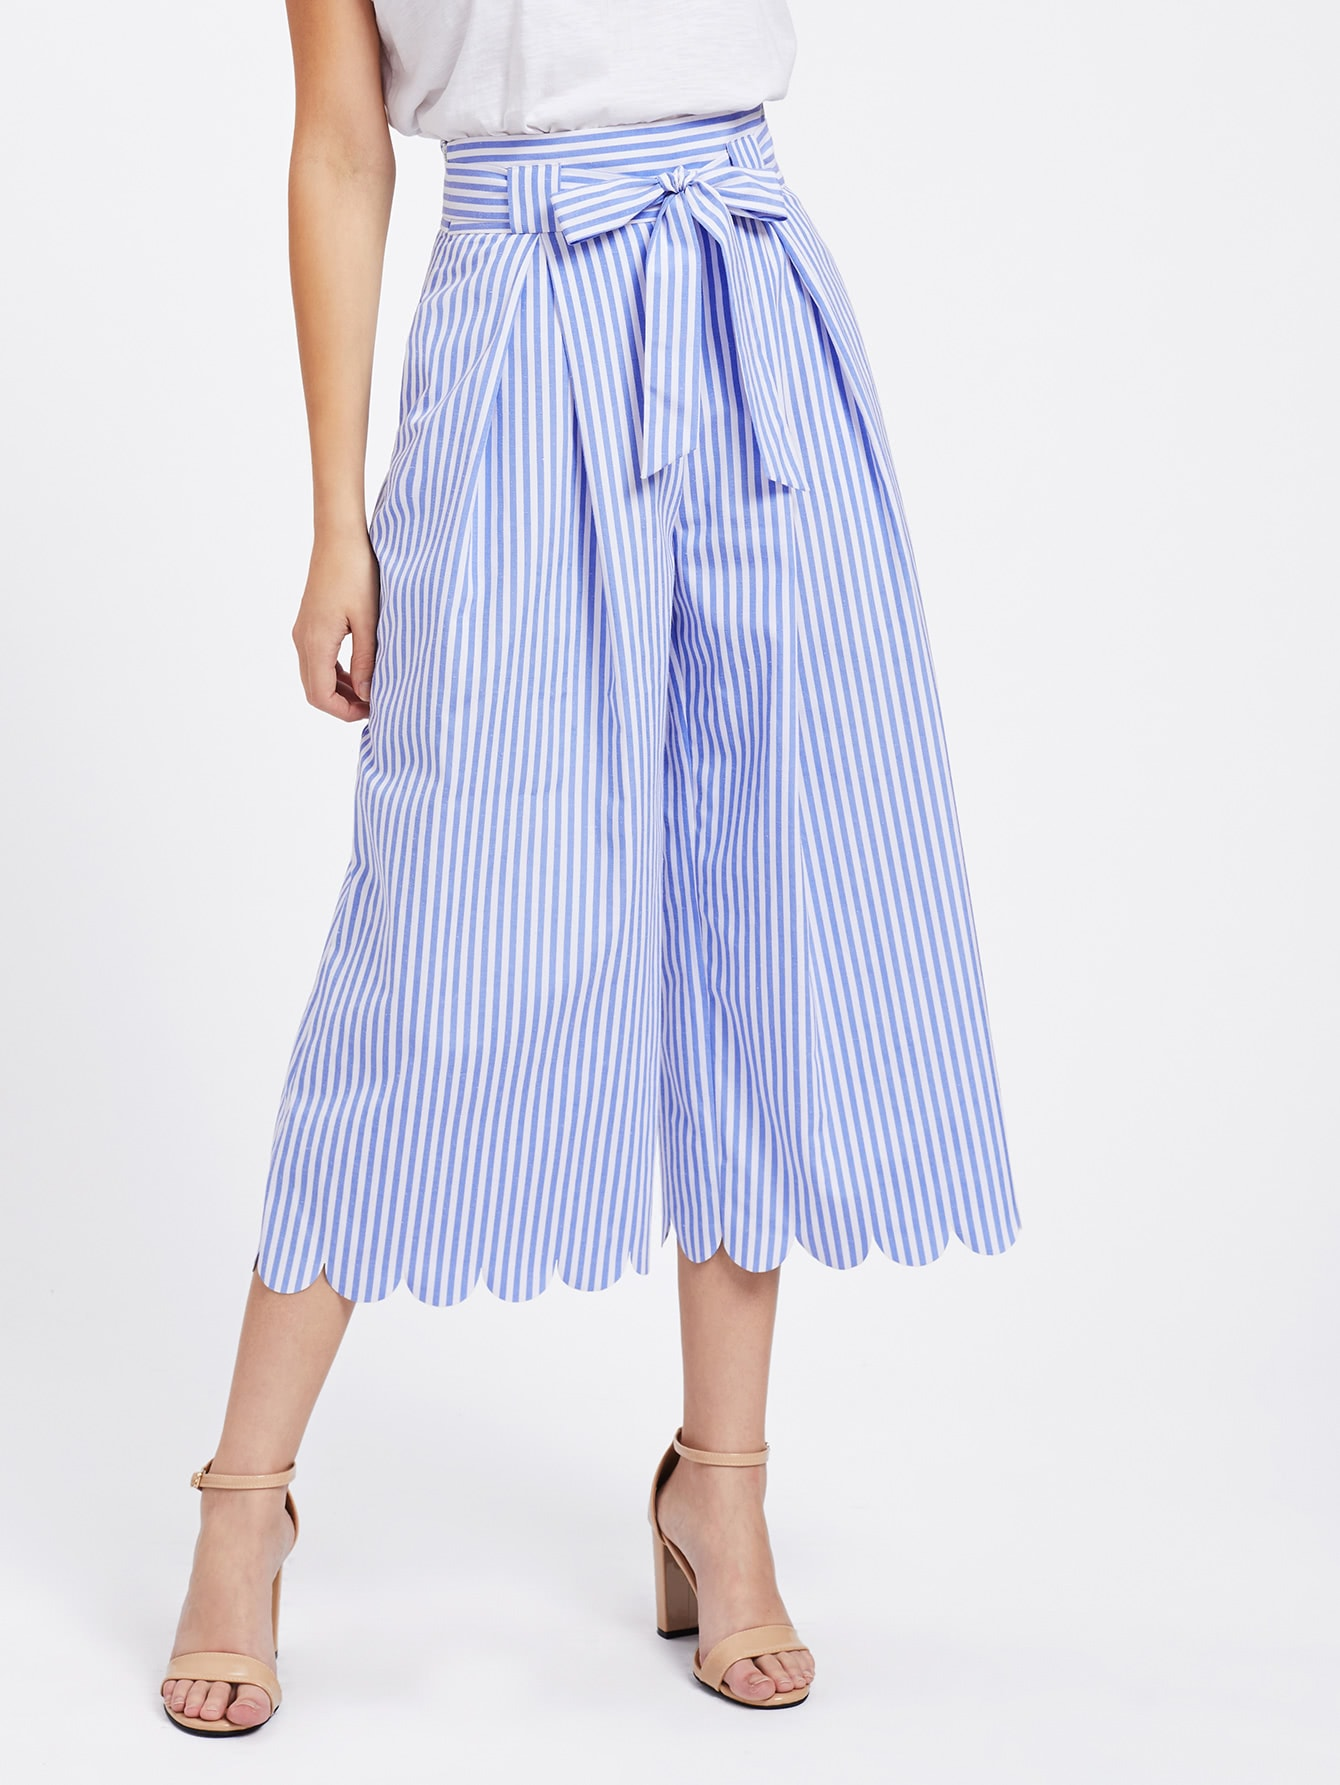 Tie Waist Scallop Hem Culotte Pants elastic waist scallop ruffle hem pants